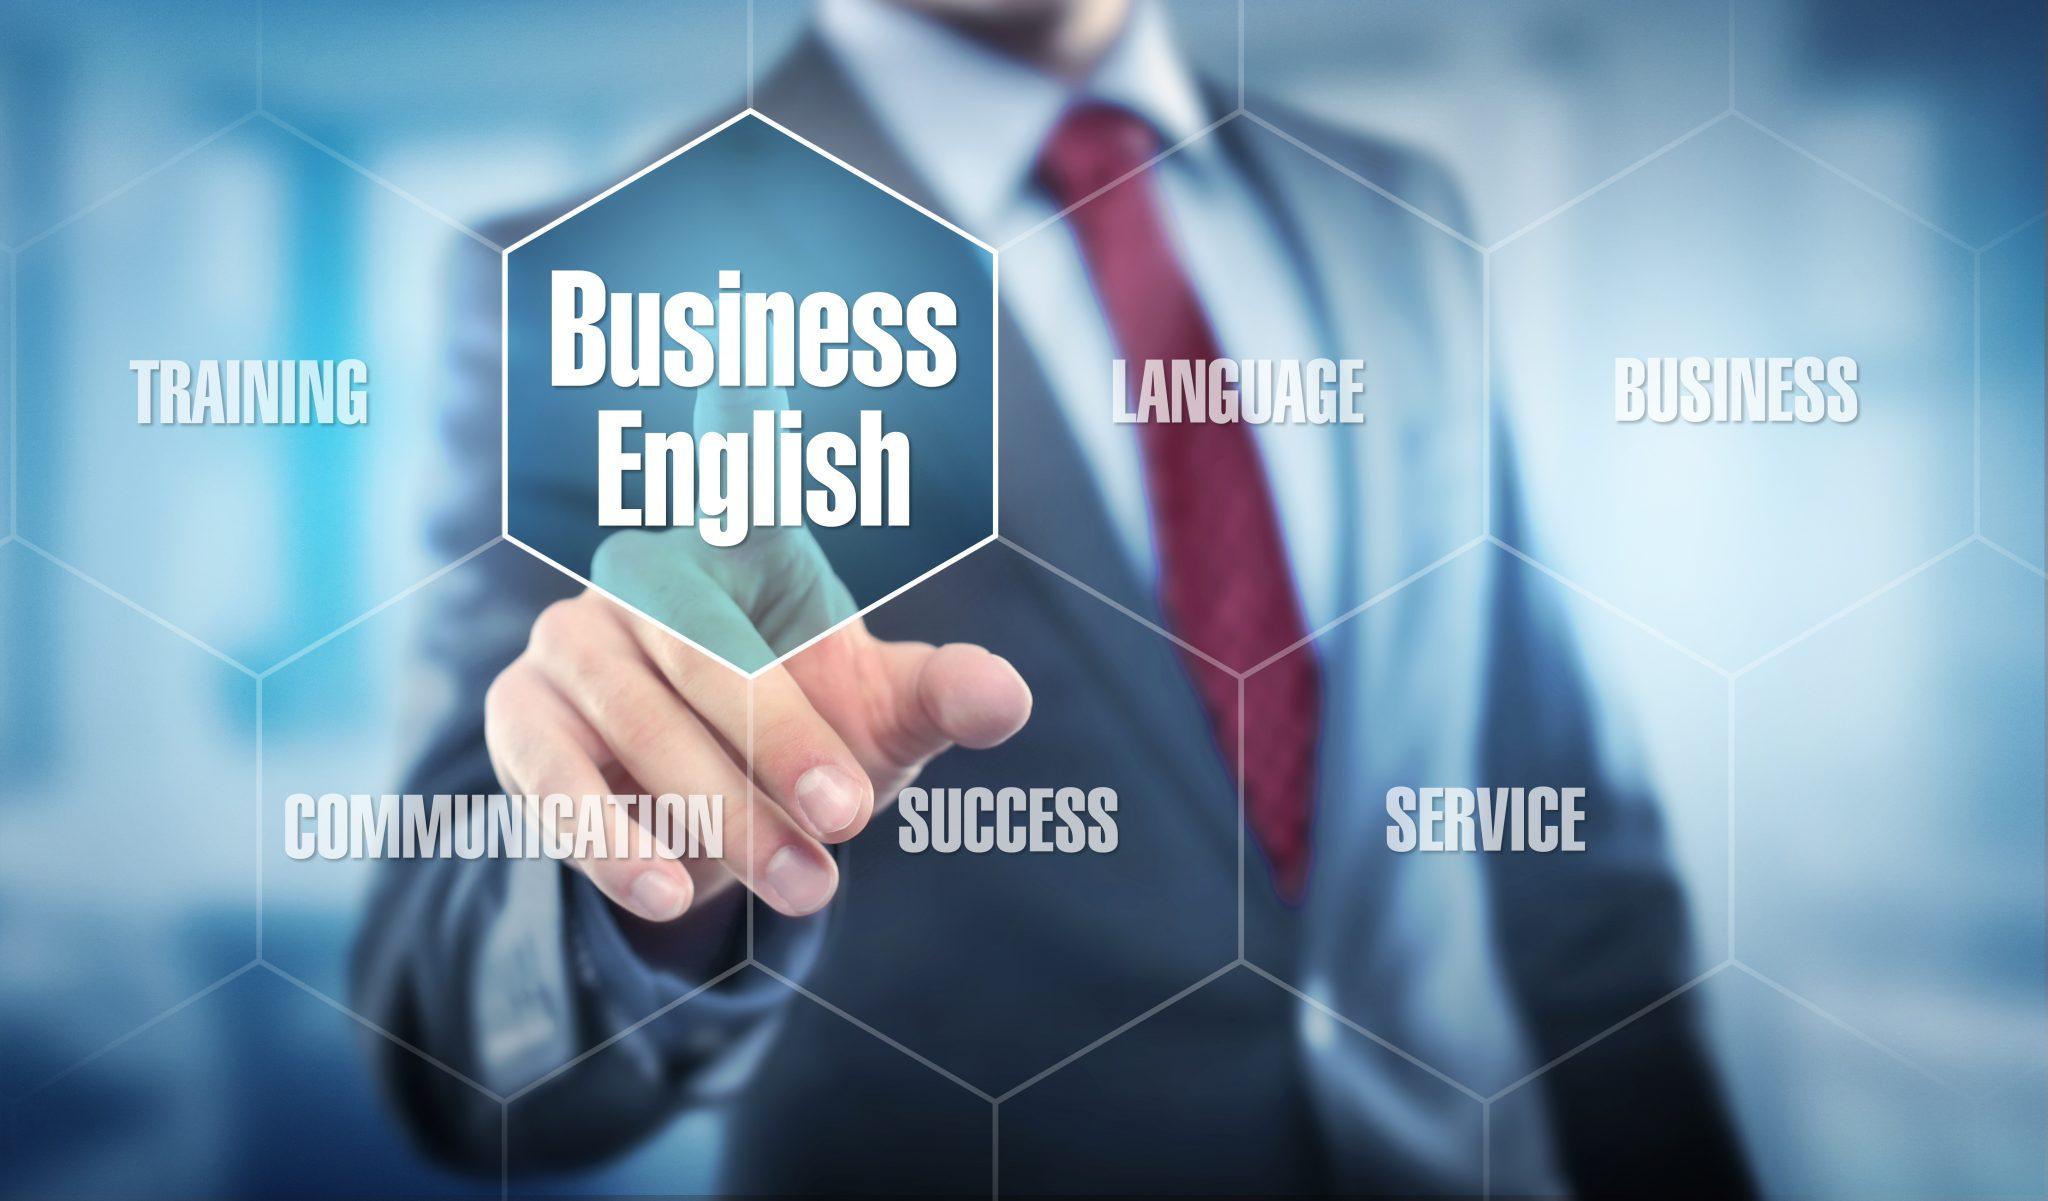 Business Englisch verhandlungsfähig sprechen